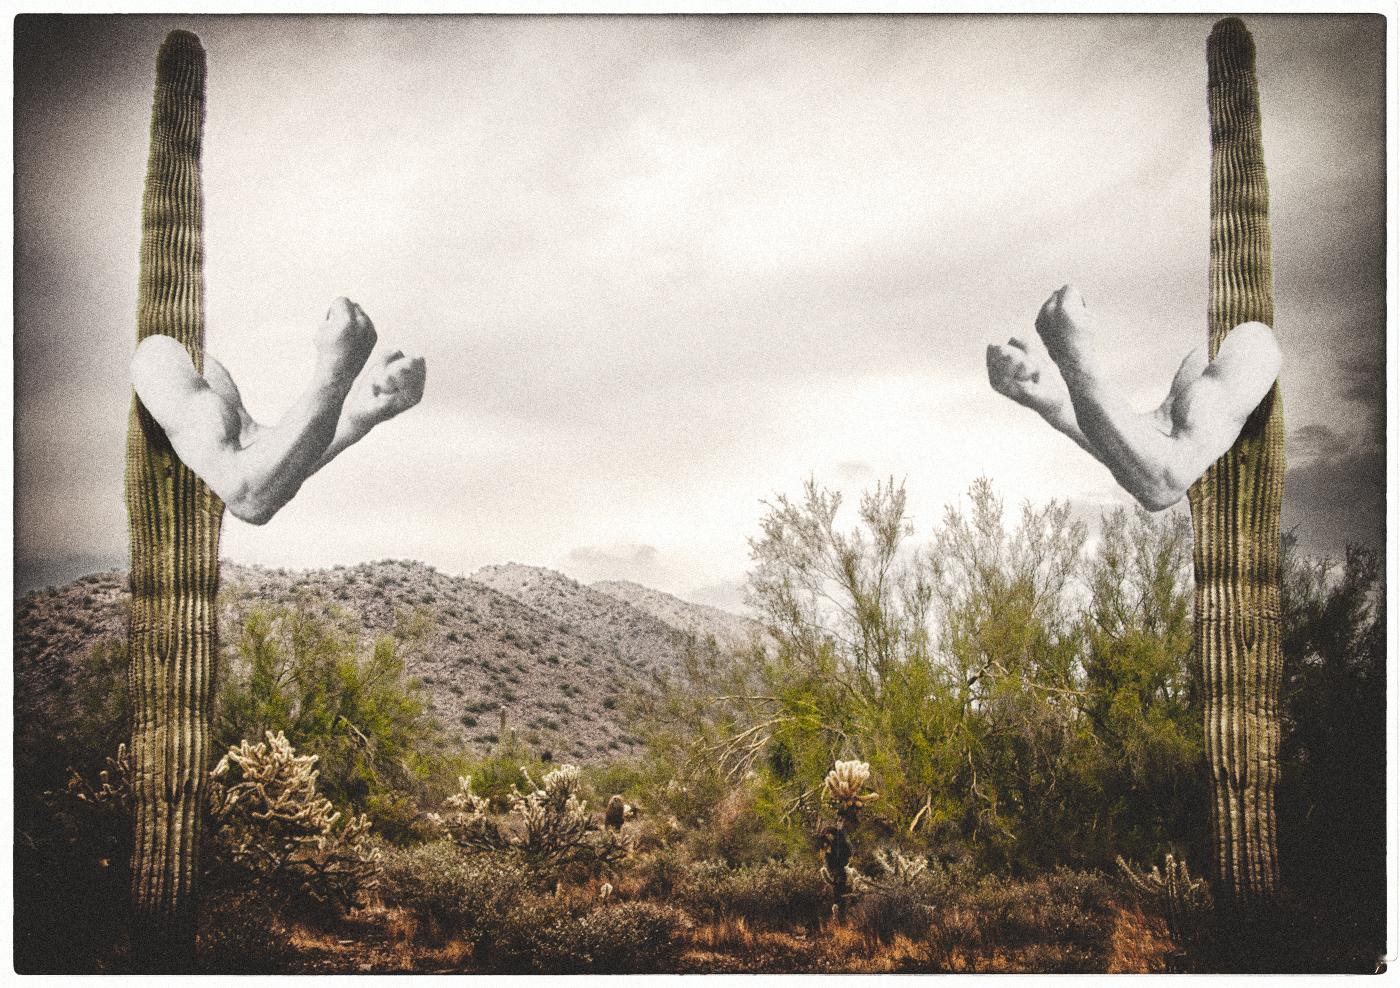 desert-cactus copy.jpg